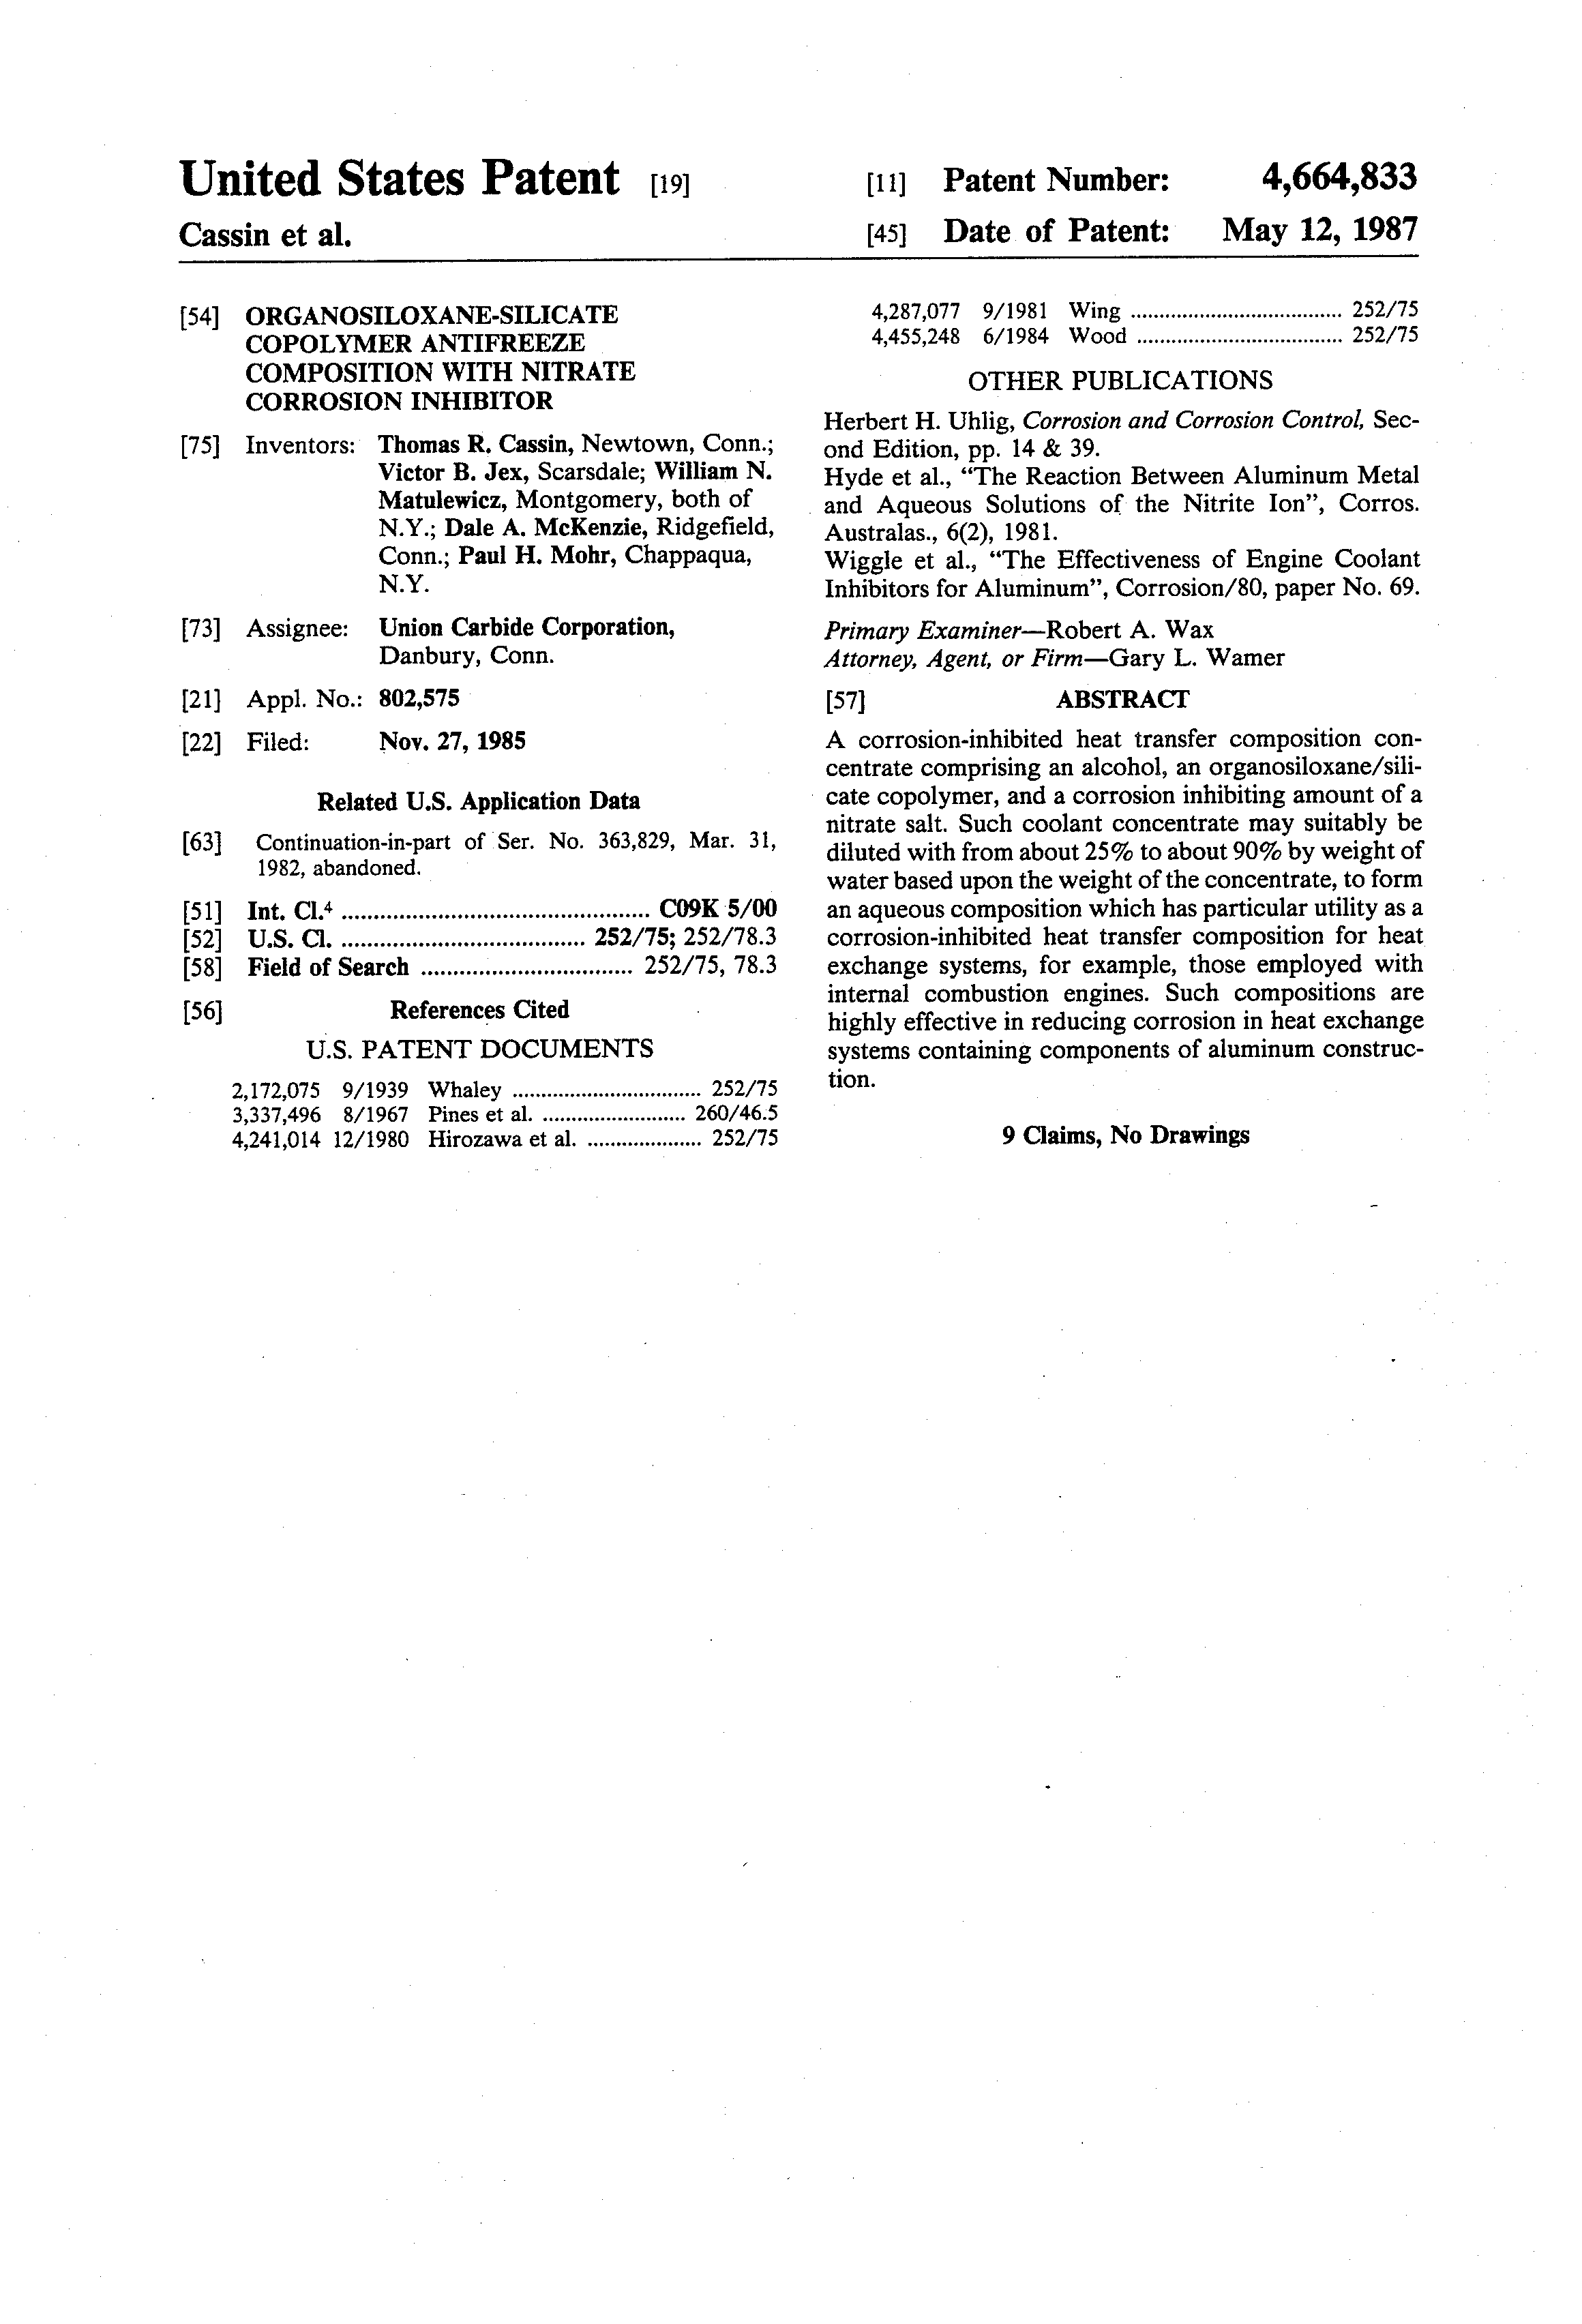 US 4664833 A - Organosiloxane-silicate Copolymer Antifreeze